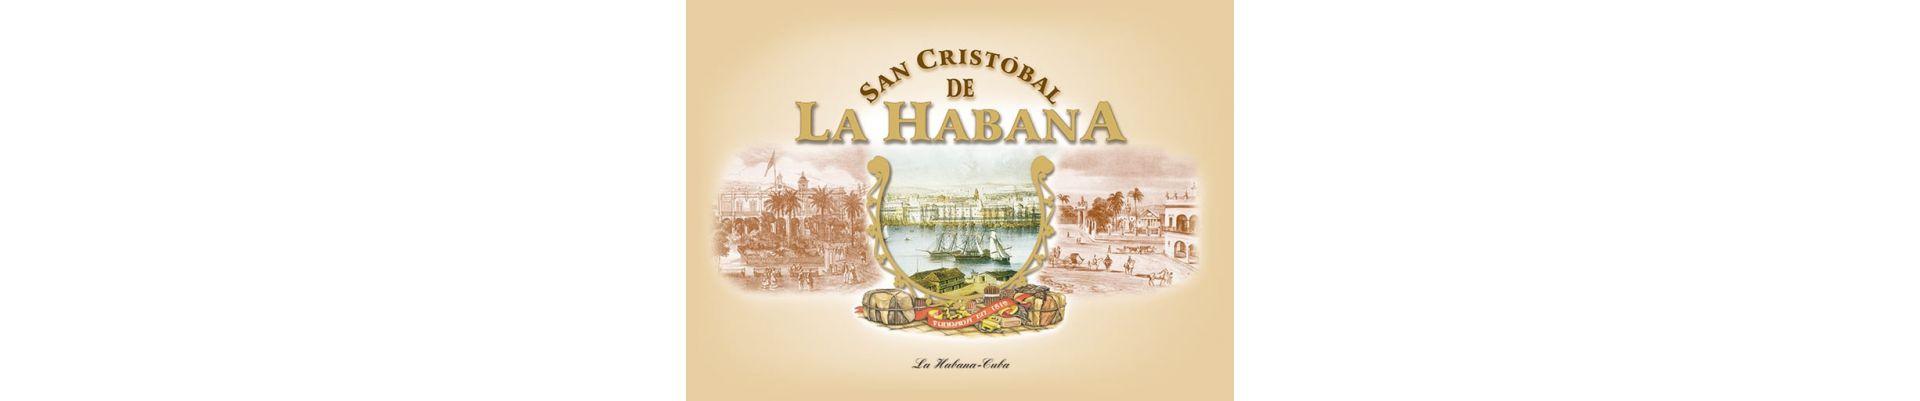 Trabucuri San Cristobal de la Habana.Pret trabucuri cubaneze vanzare